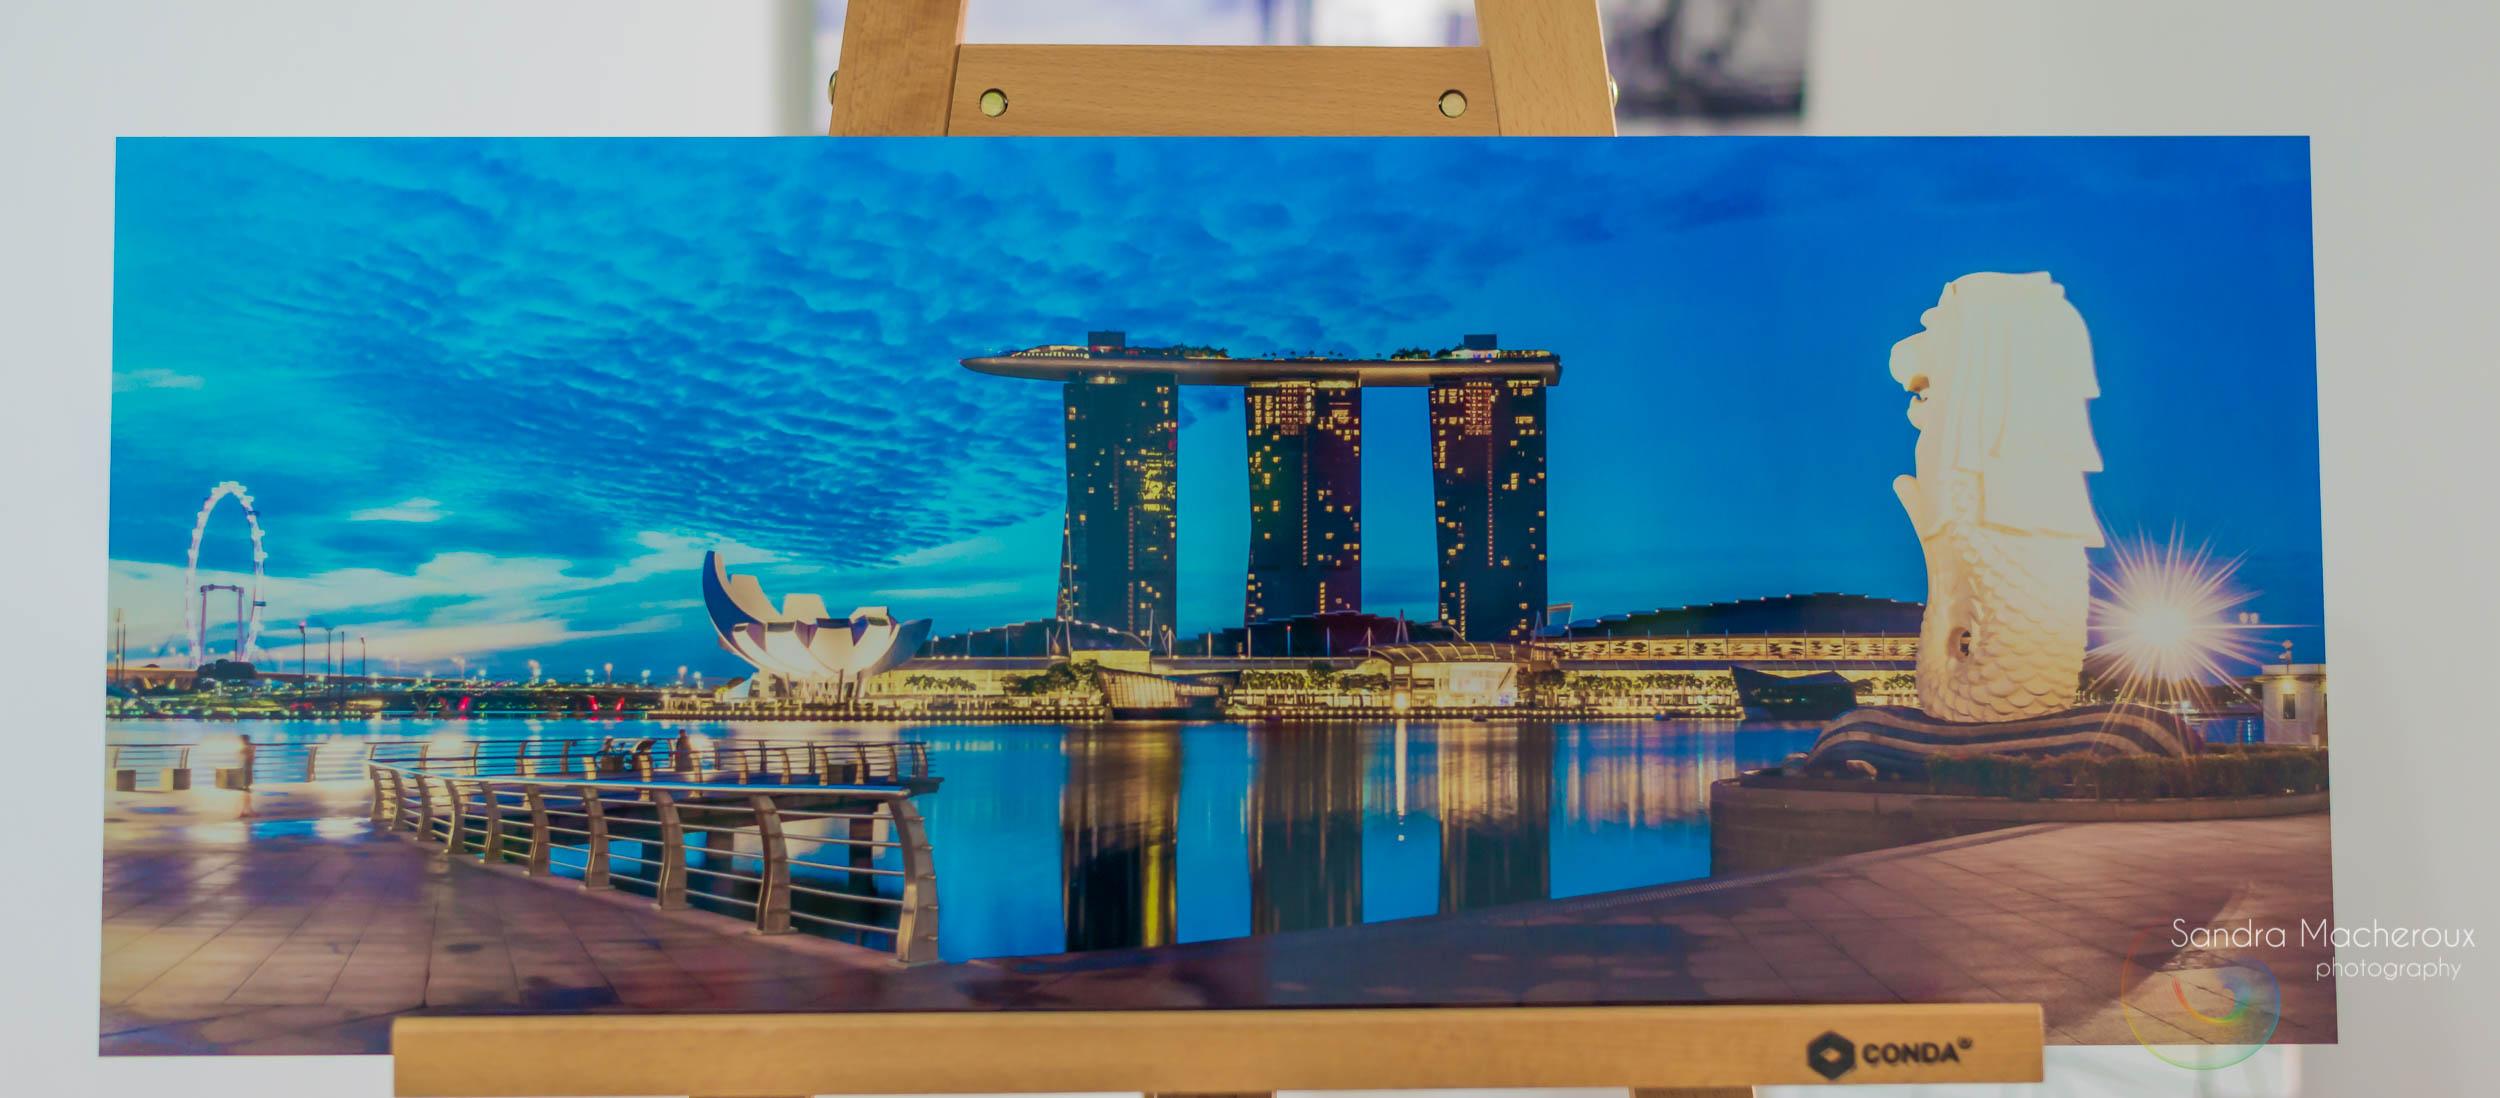 Creative-Sparq By Ayesha Kohli featuring Sandra Macheroux's Marina Bay and Merlion At Dawn, Singapore